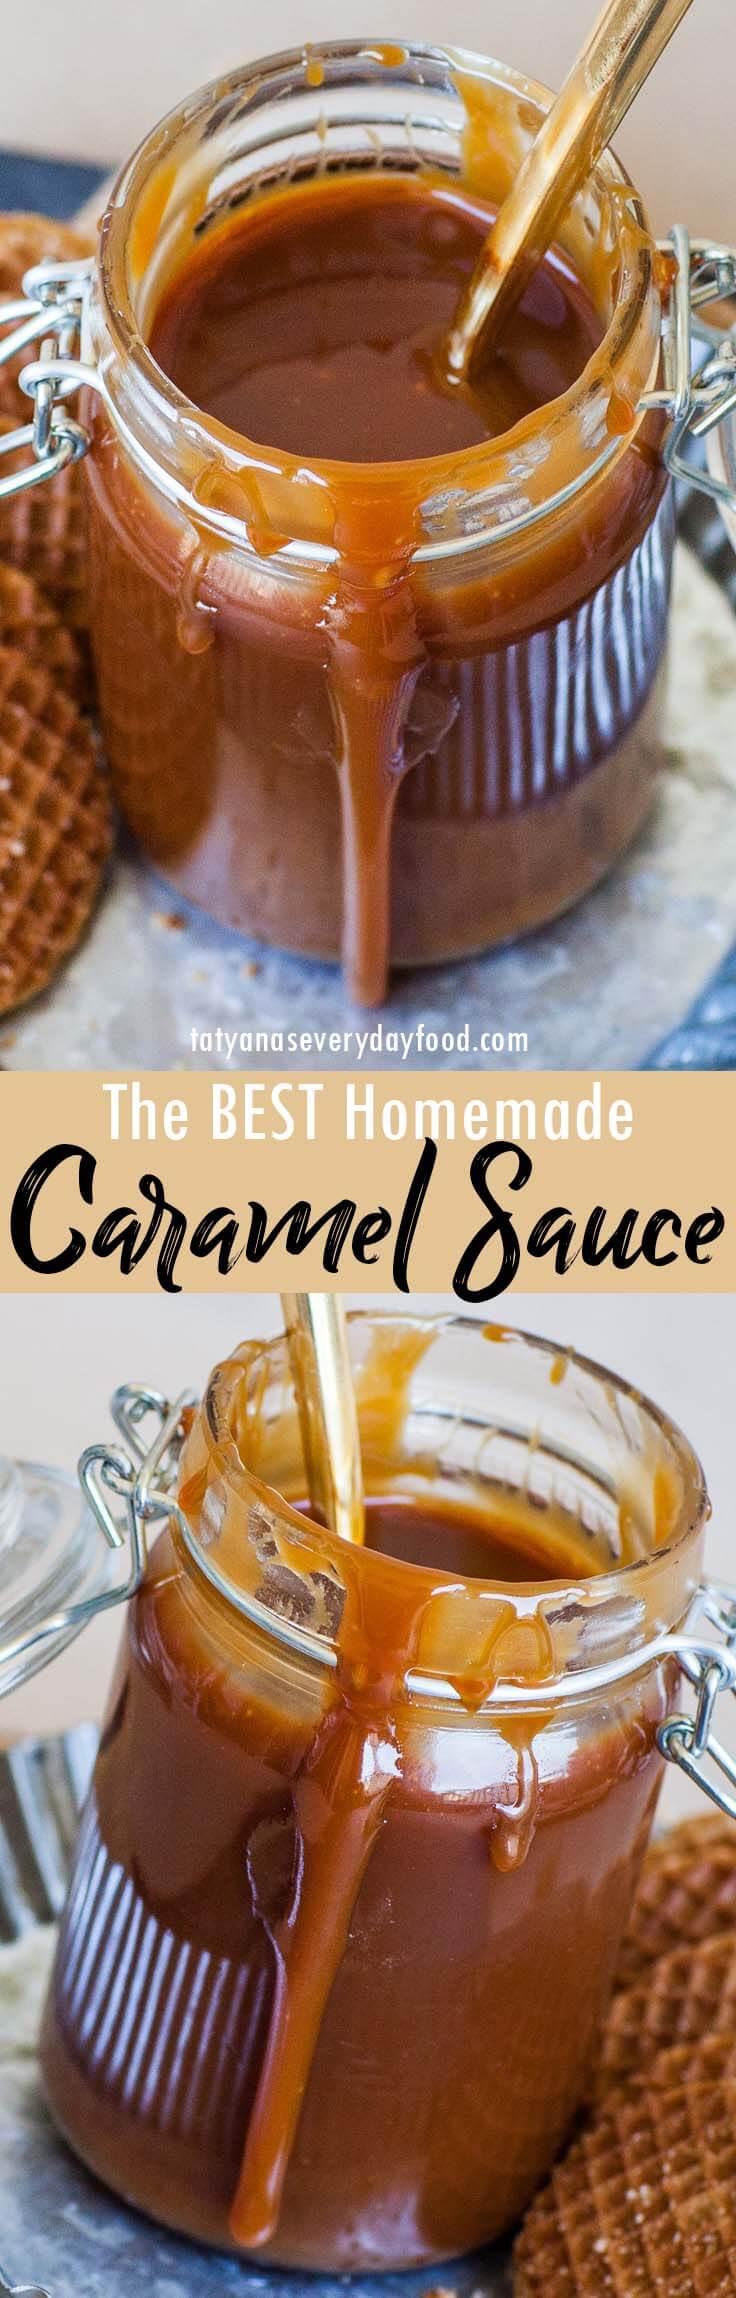 Best Caramel Sauce video recipe